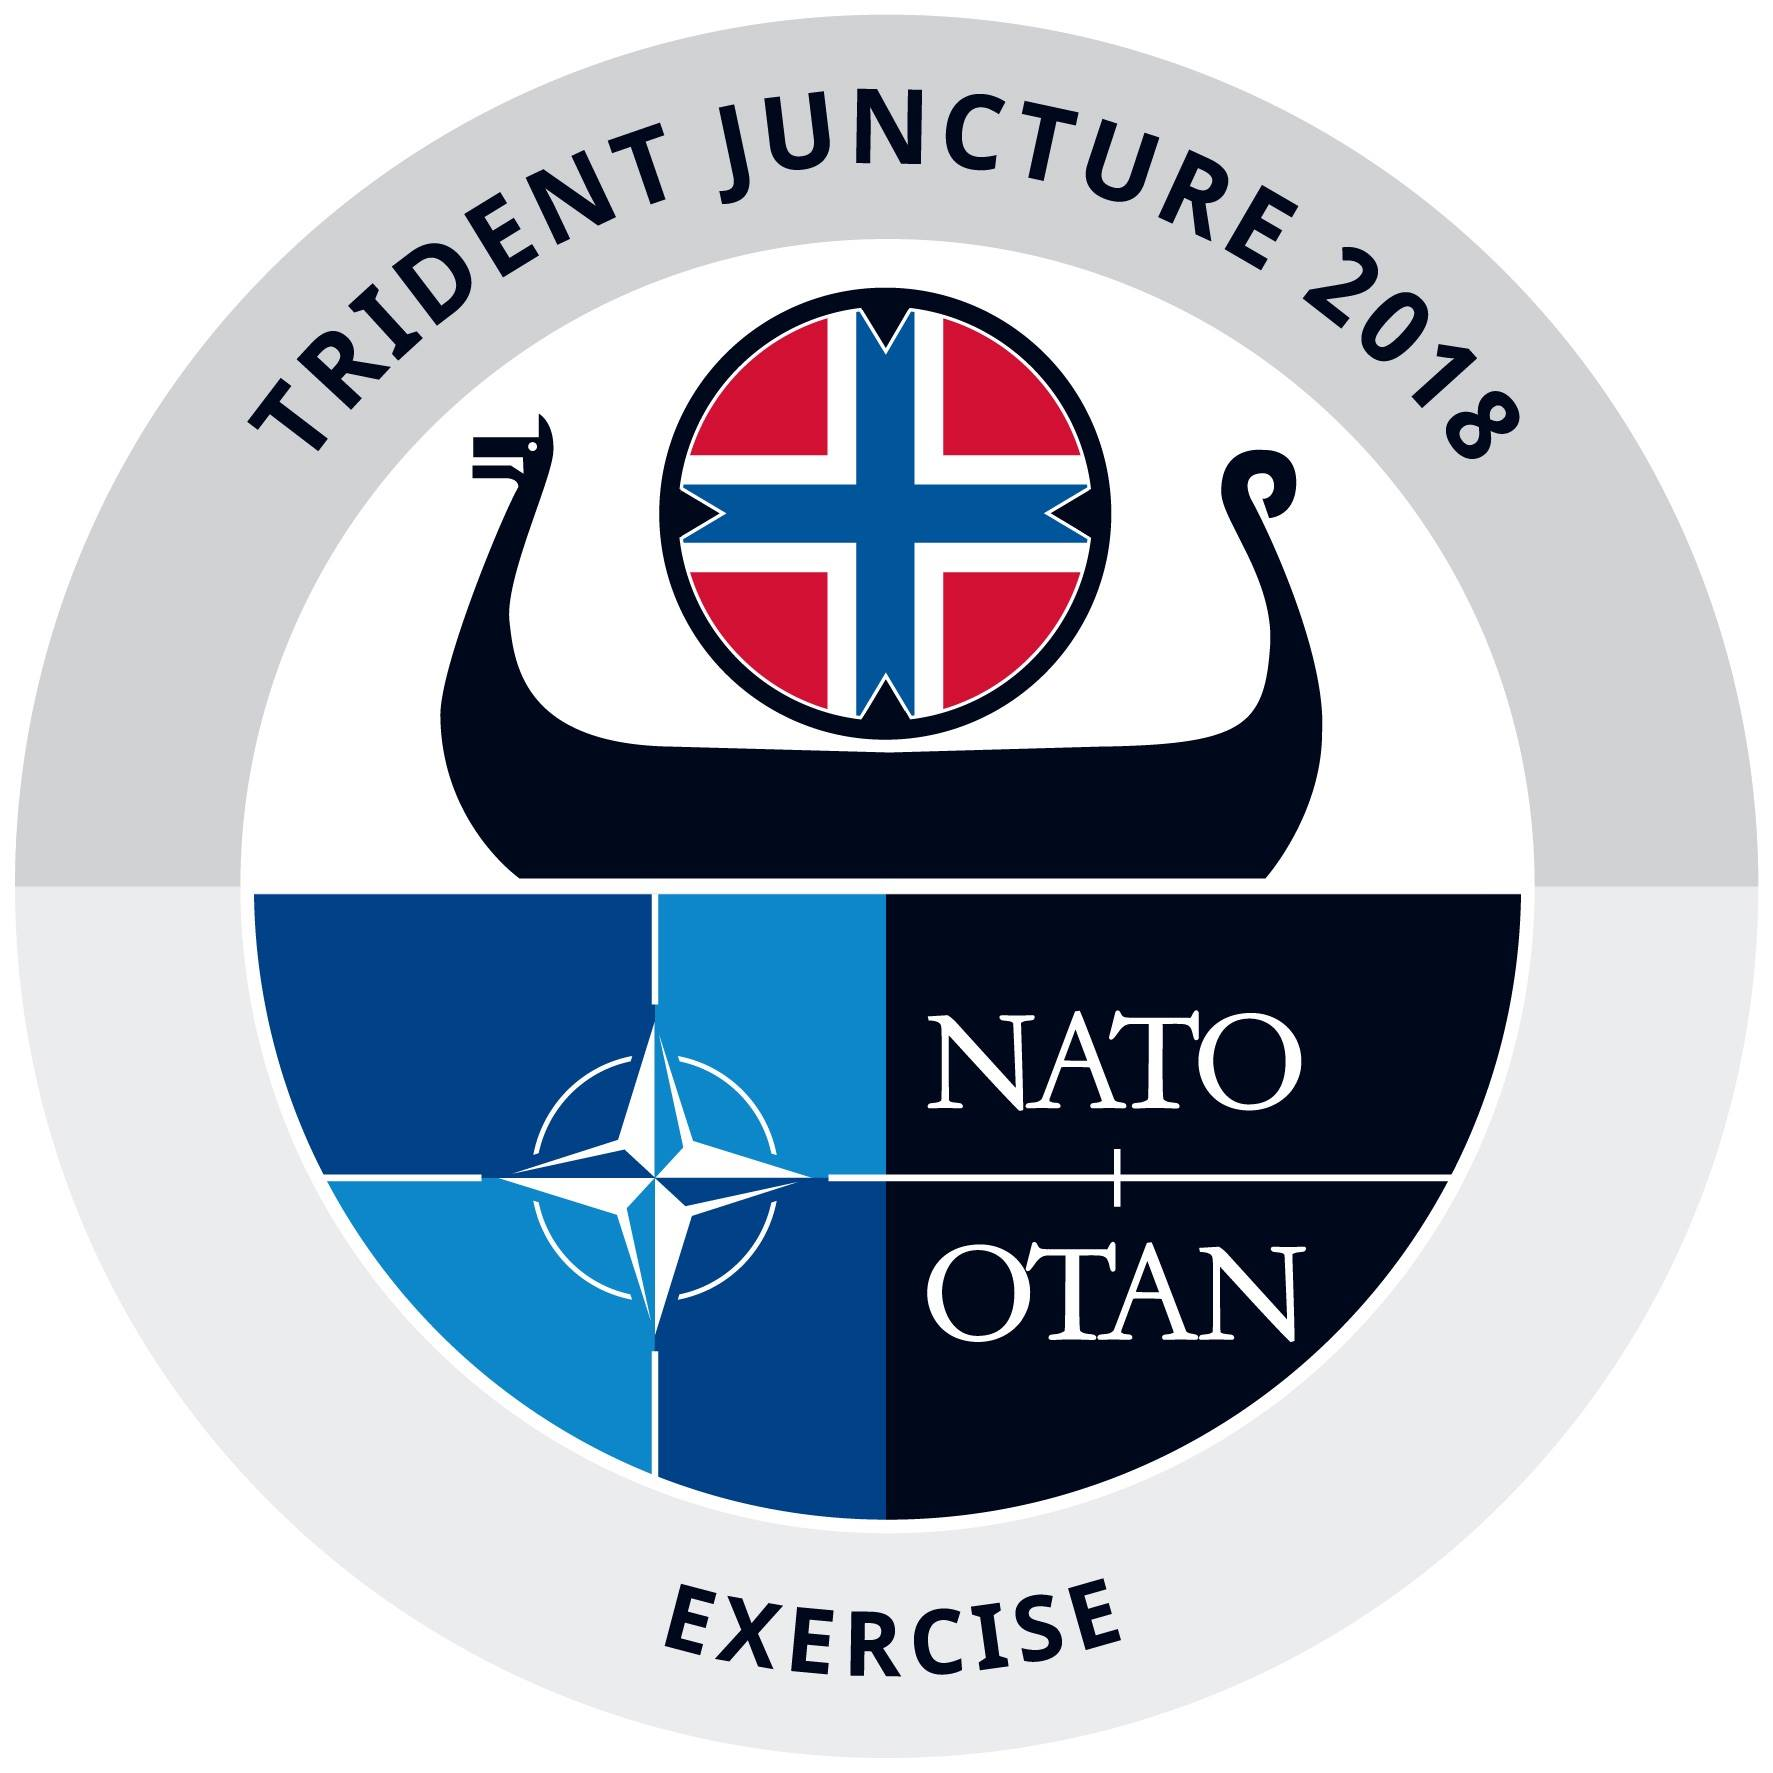 Trident Juncture 2018 Logo